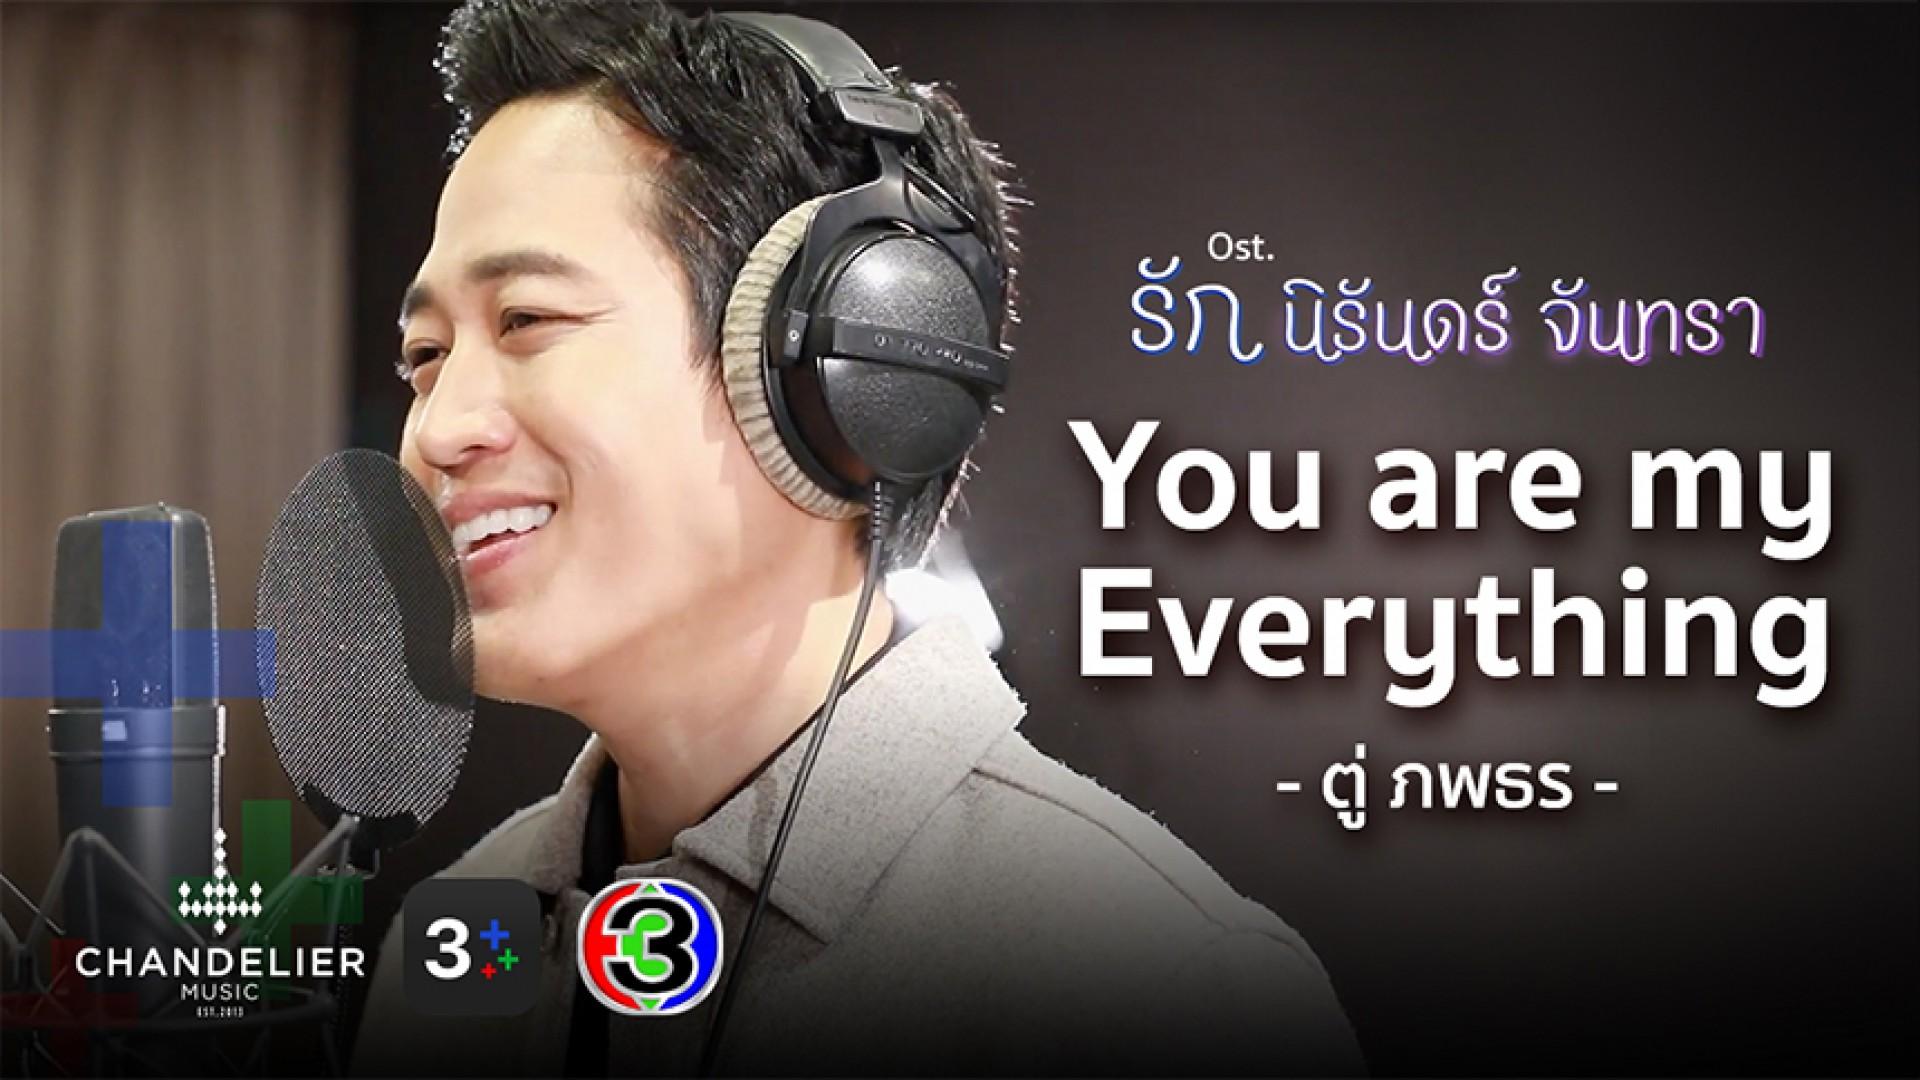 You are my Everything Ost.รัก นิรันดร์ จันทรา | ตู่ ภพธร สุนทรญาณกิจ  | Official MV